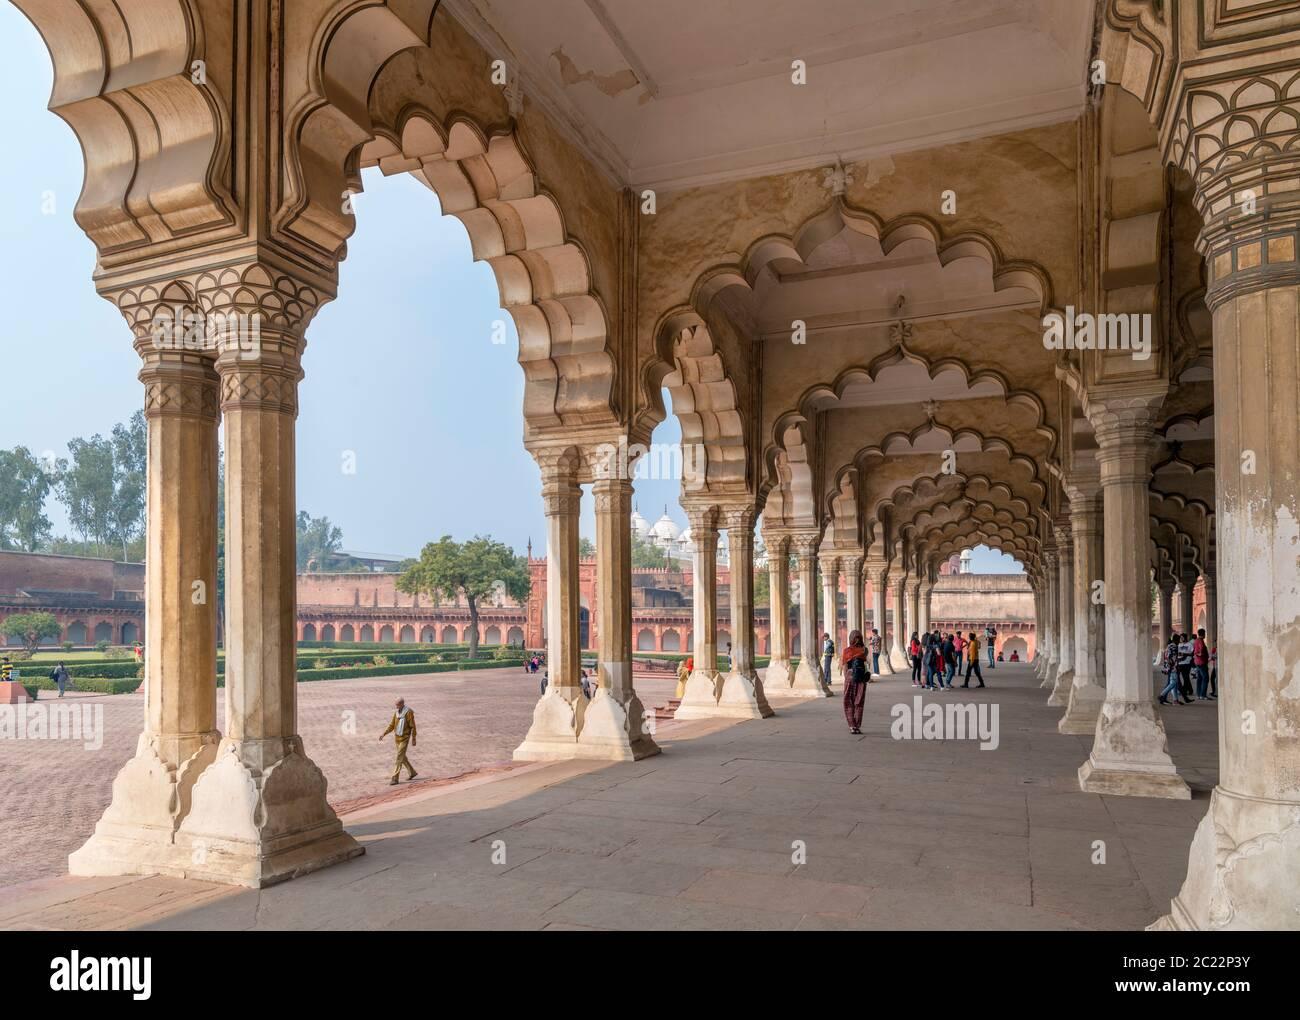 The Diwan-i-am (Hall of Public Audiences) in Agra Fort, Agra, Uttar Pradesh, India Stock Photo